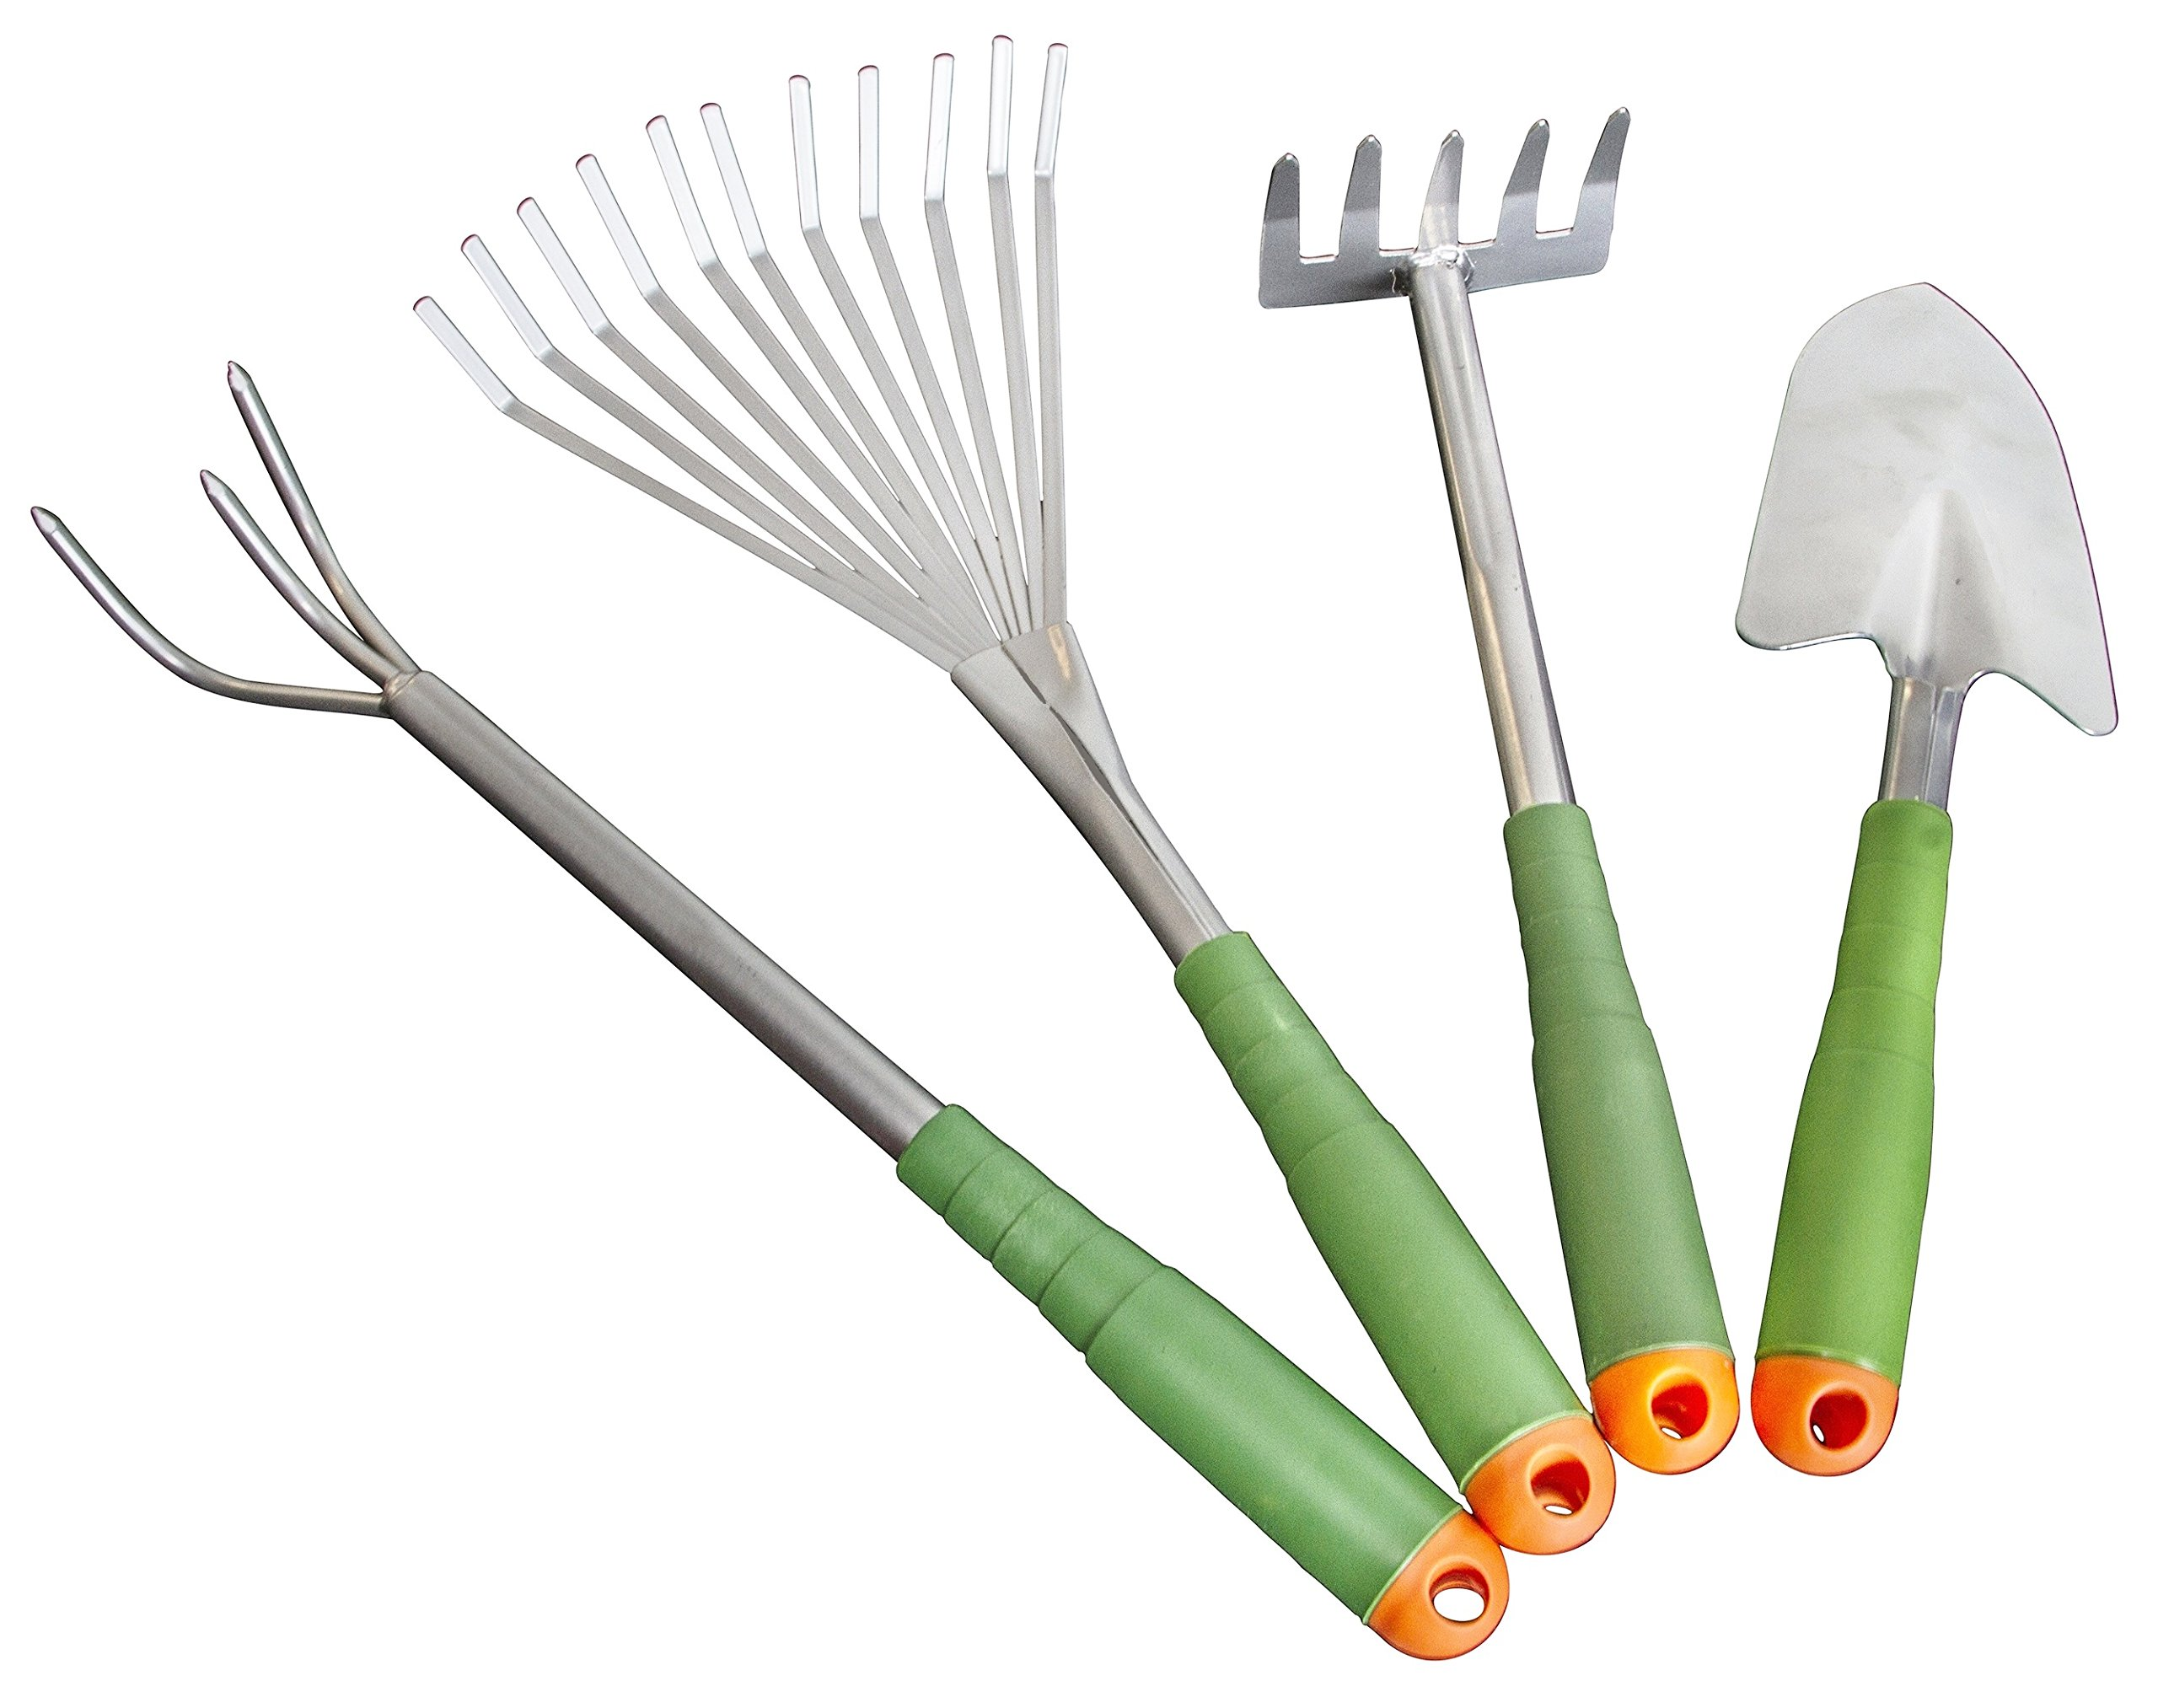 Gardening Tool Set - Light Duty For Women Seniors Arthritis with Extra Long Handles